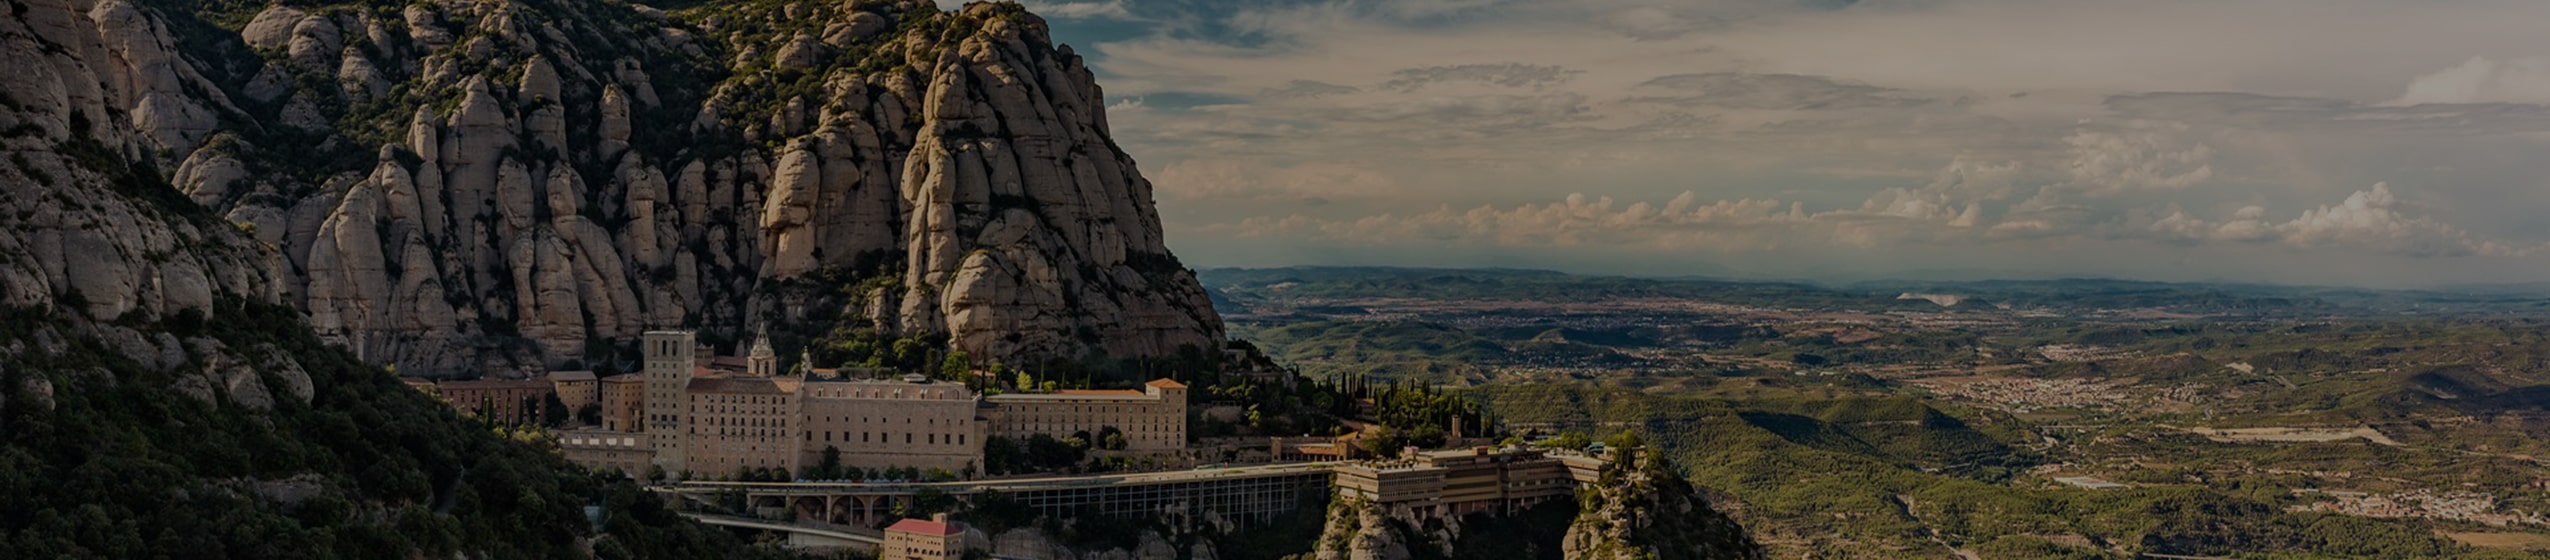 Área de Montserrat